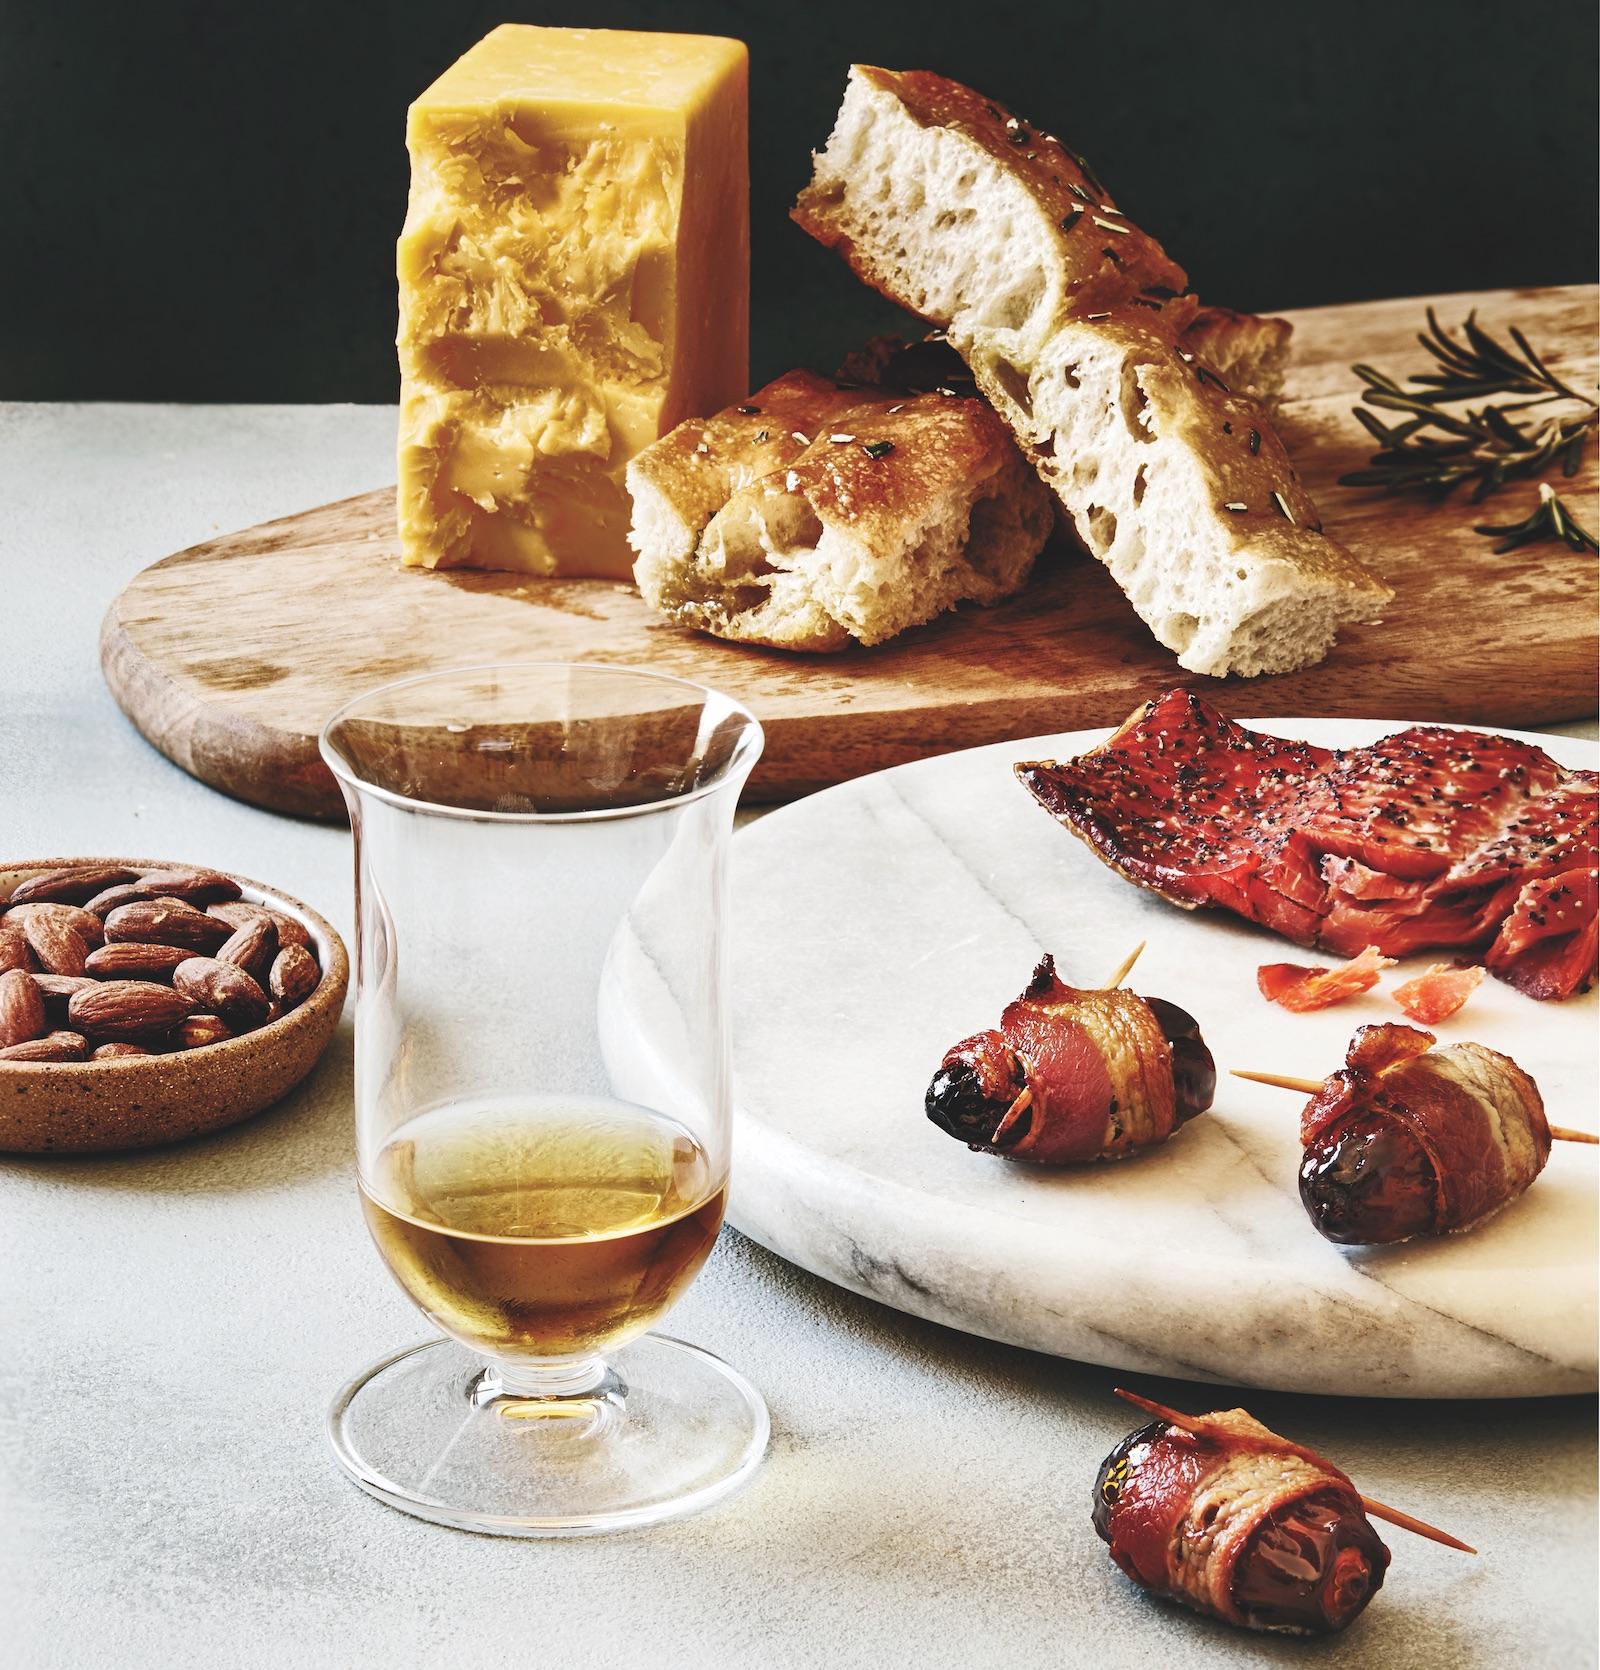 focaccia, cheddar, bacon-wrapped dates, almonds, smoked salmon with a glass of sherried single malt scotch